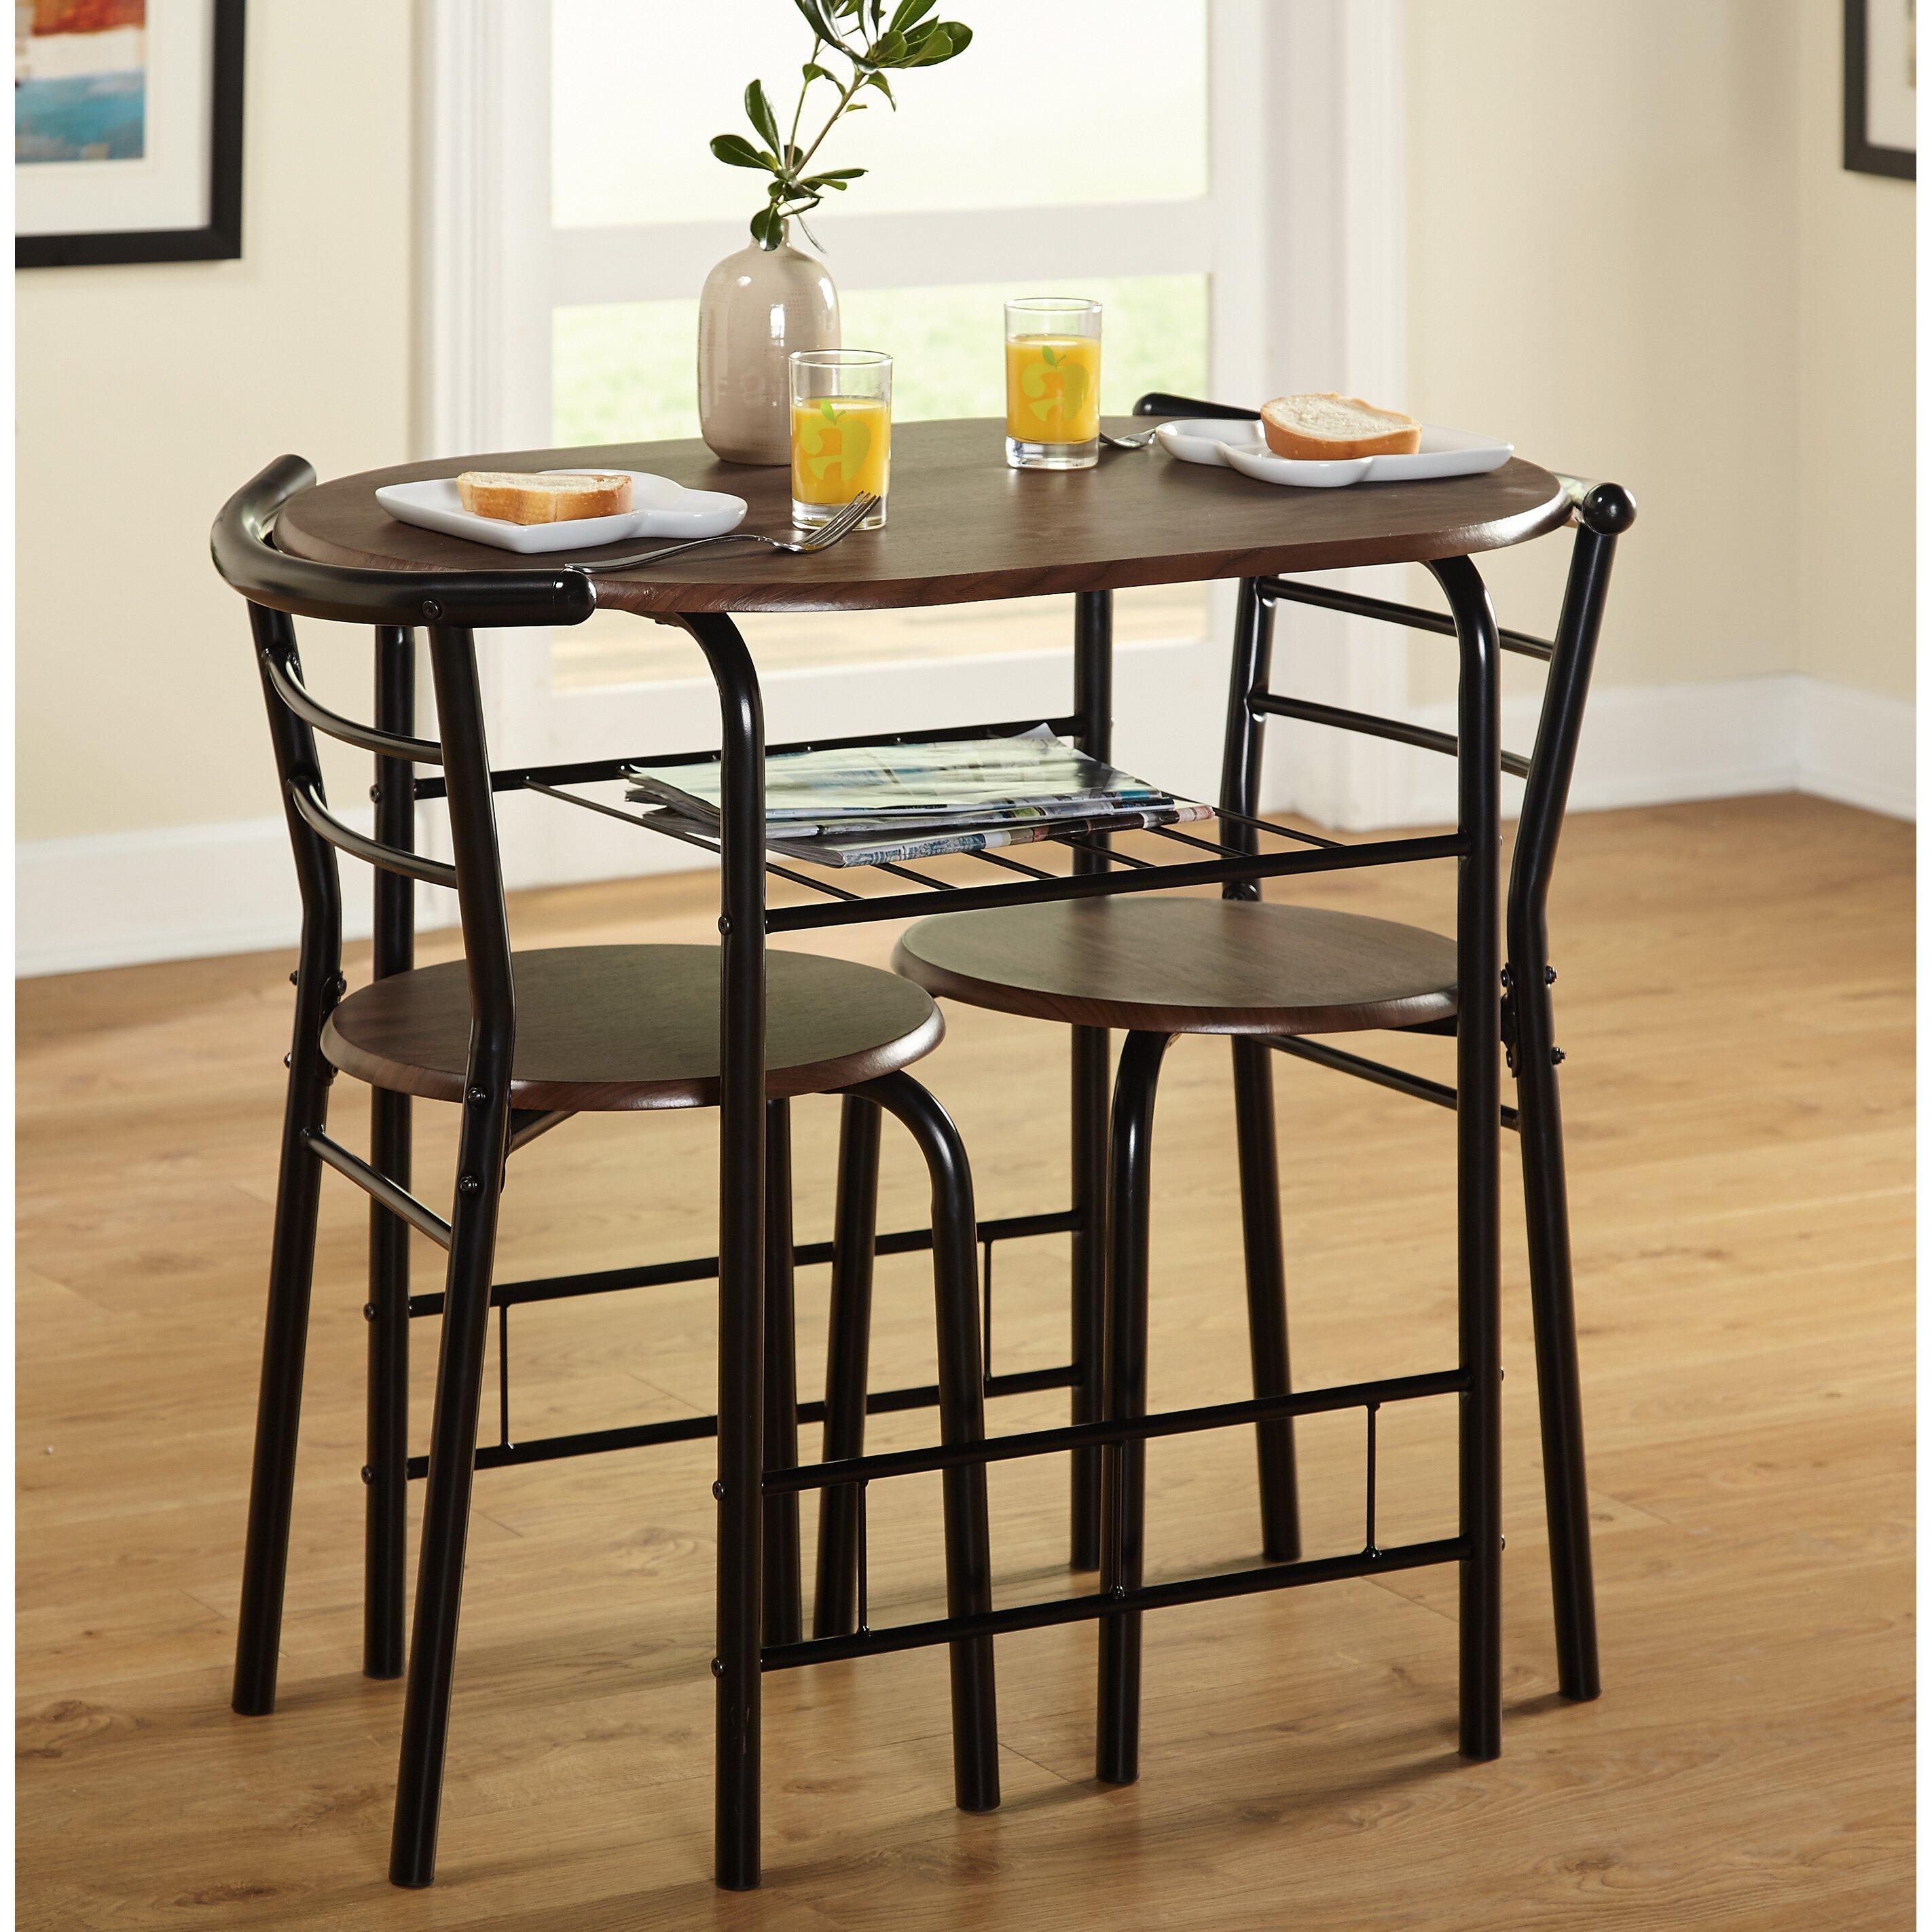 tms bistro 3 piece compact dining set reviews wayfair. Black Bedroom Furniture Sets. Home Design Ideas